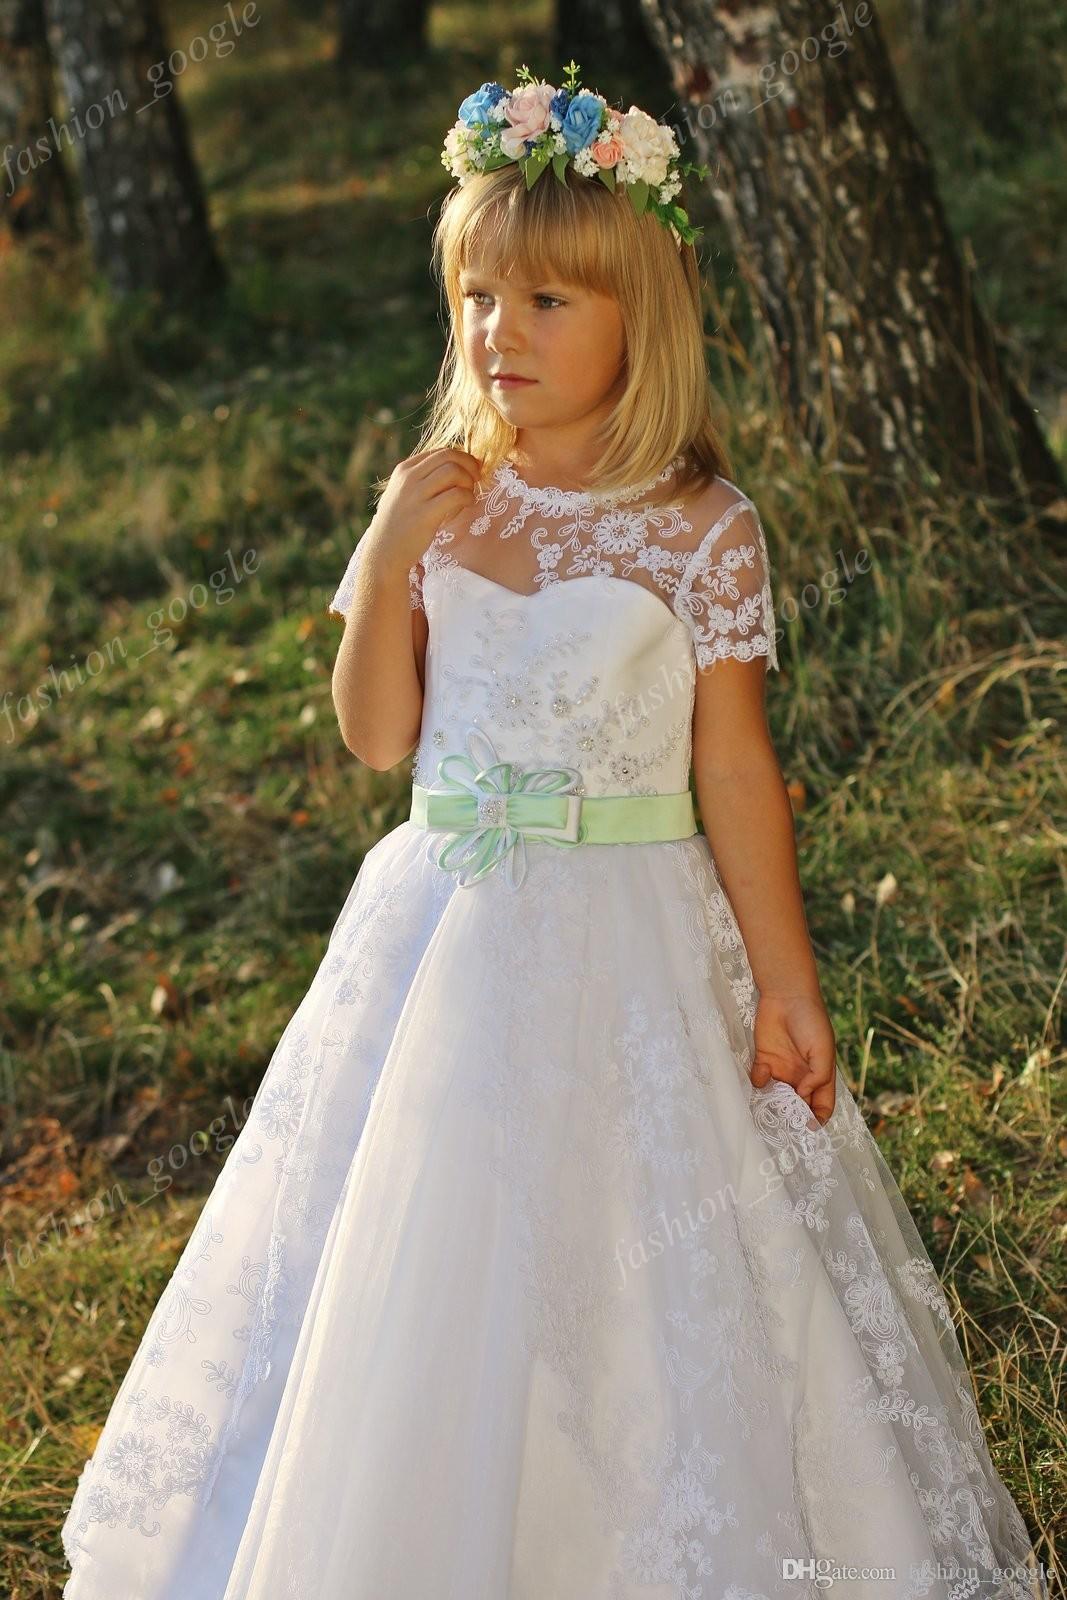 4a4f1ee5bf3 Pretty Lace 1st Communion Dresses For Little Girls 2018 Modern Sleeves    Mint Sash Elegant Mother Daughter Wedding Dress For Flower Girls Toddler  Girls ...